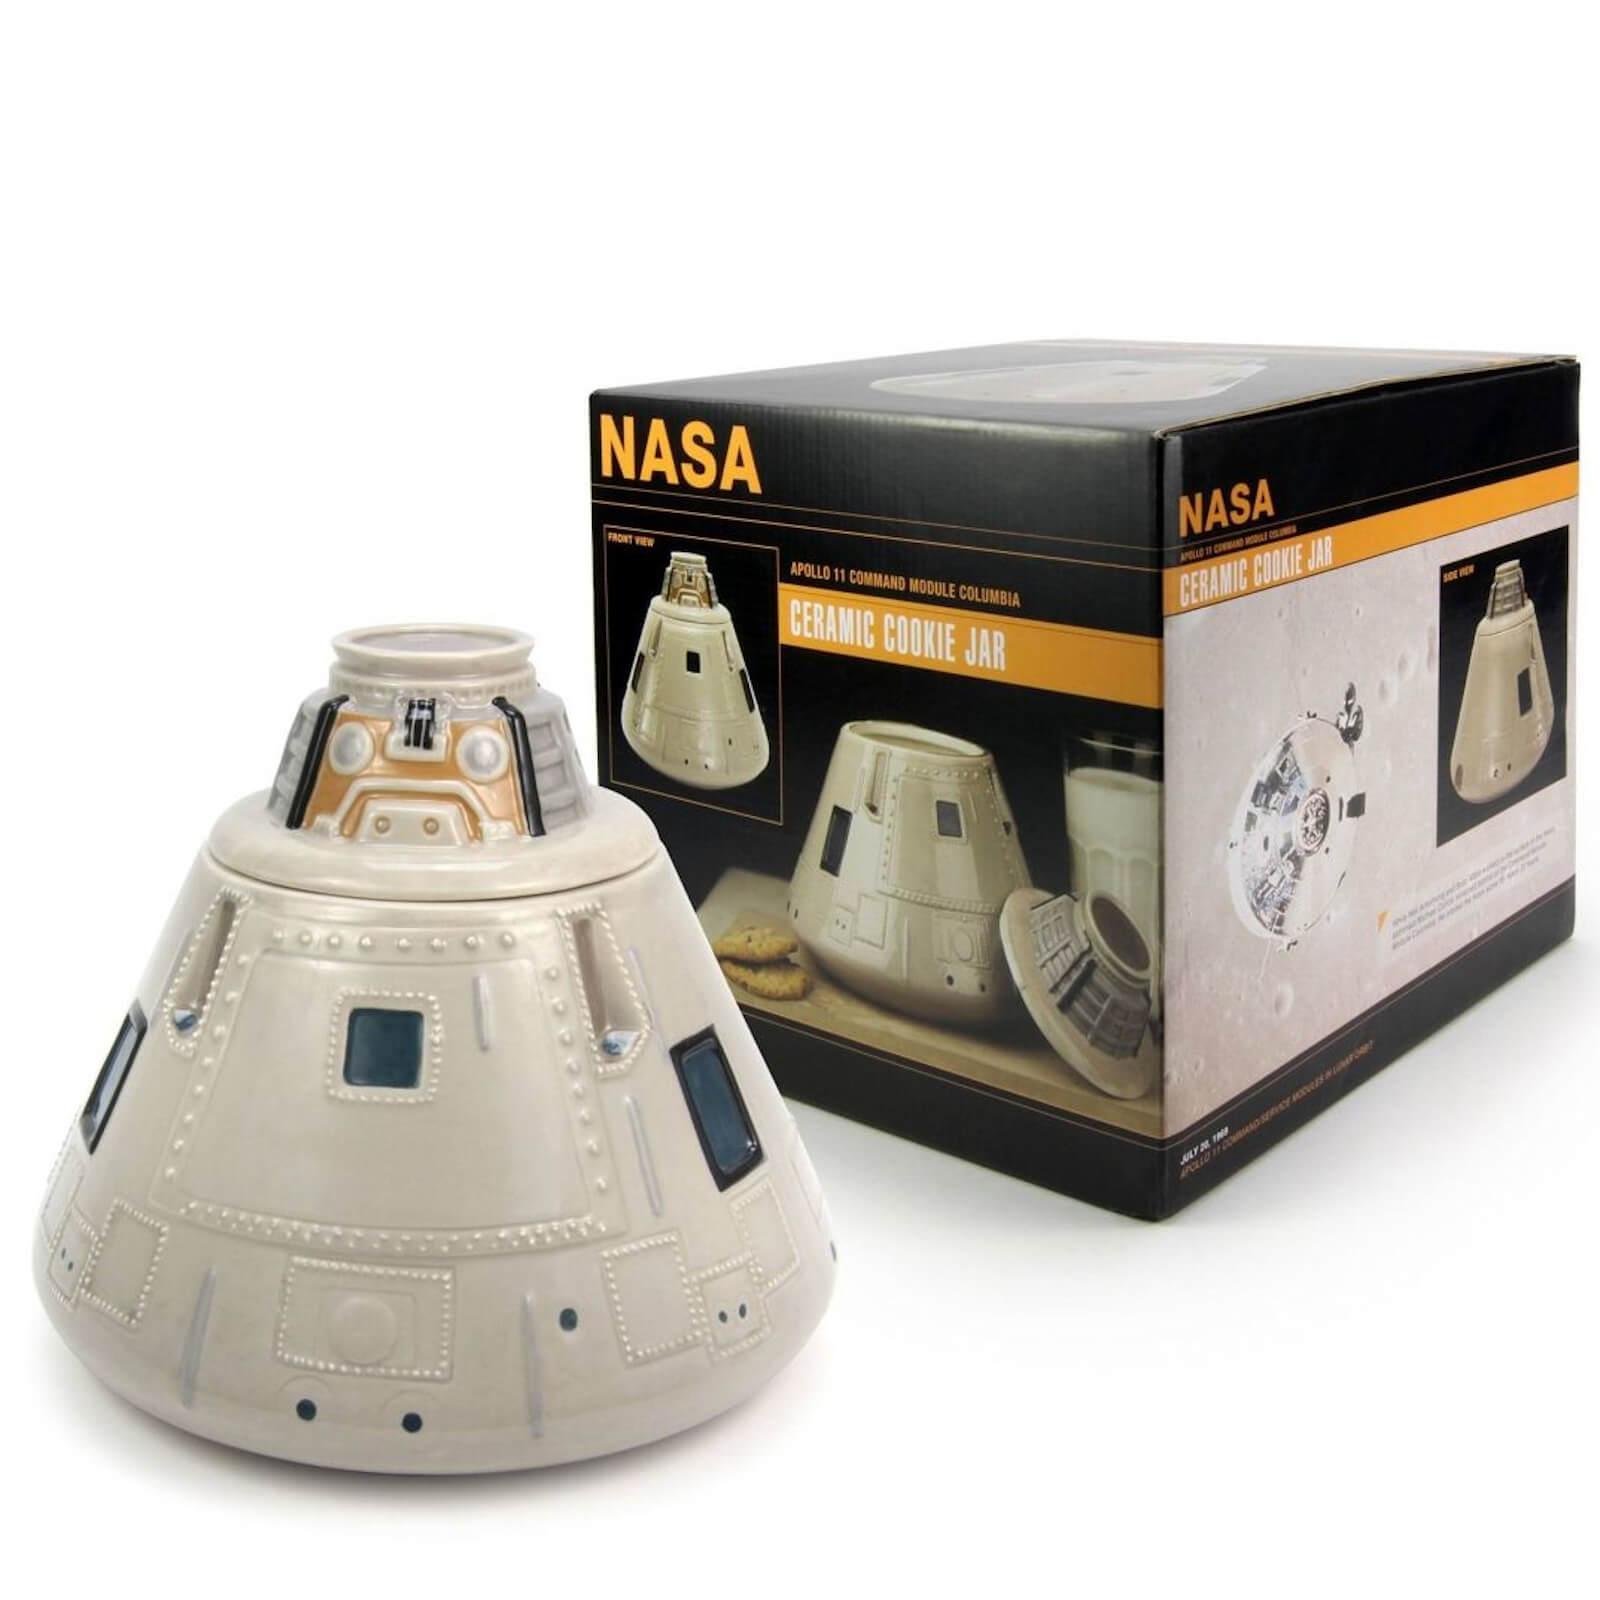 The Coop NASA Apollo Capsule Cookie Jar